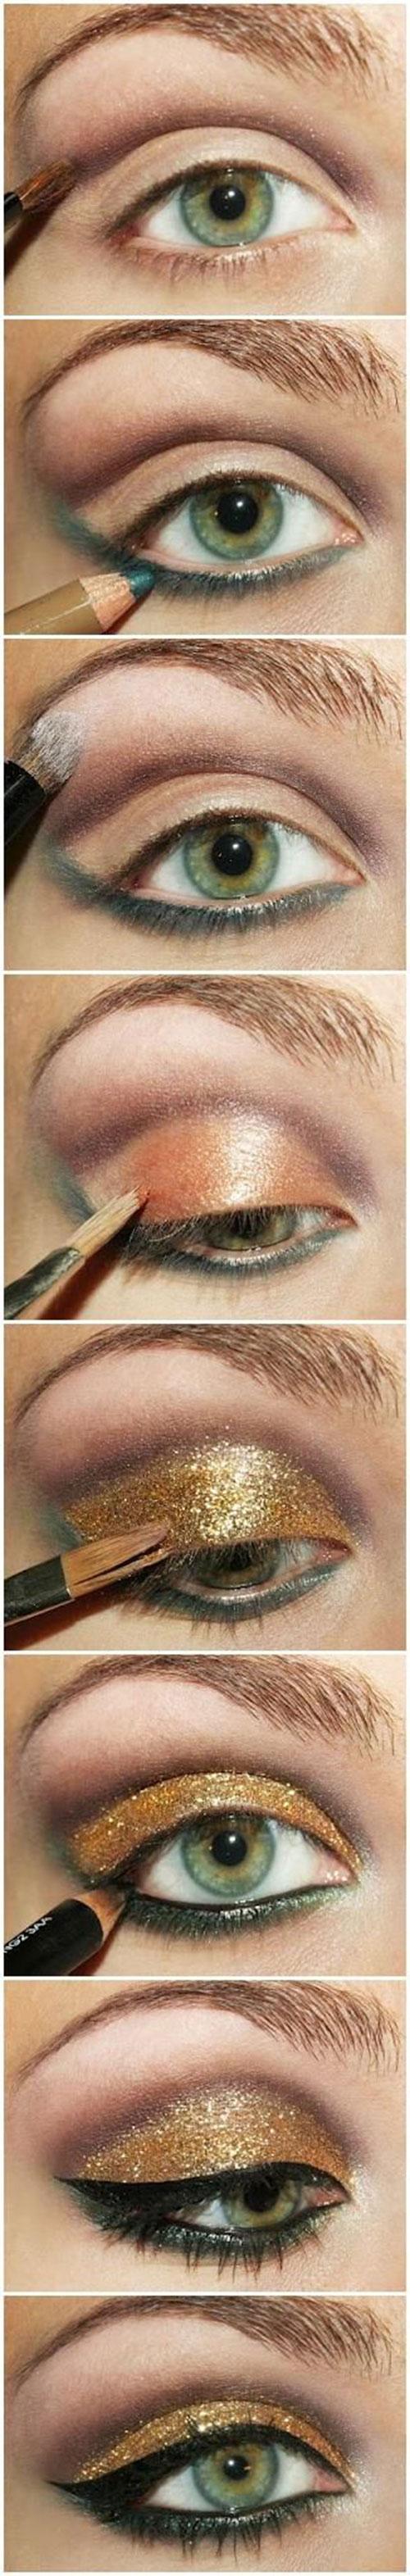 20-Happy-New-Year-Eve-Eye-Makeup-Tutorial-2015-14